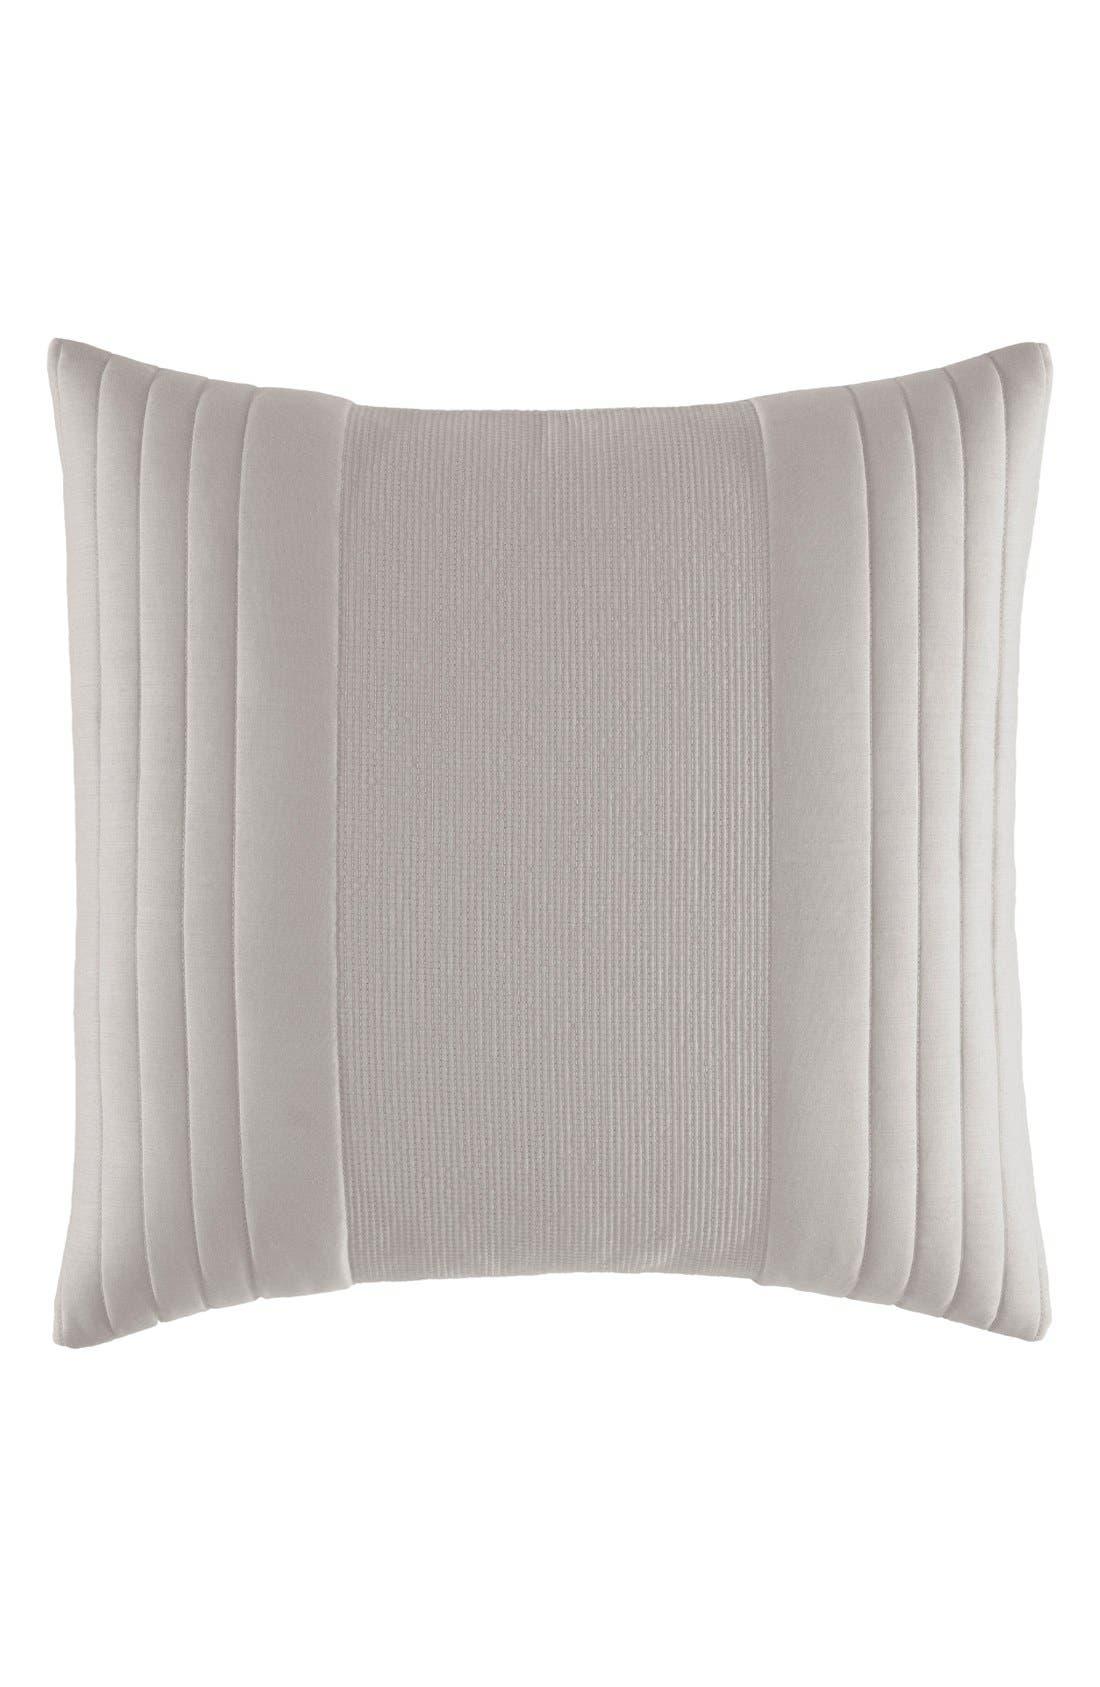 Texture Stripe Pillow,                             Main thumbnail 1, color,                             Grey Putty